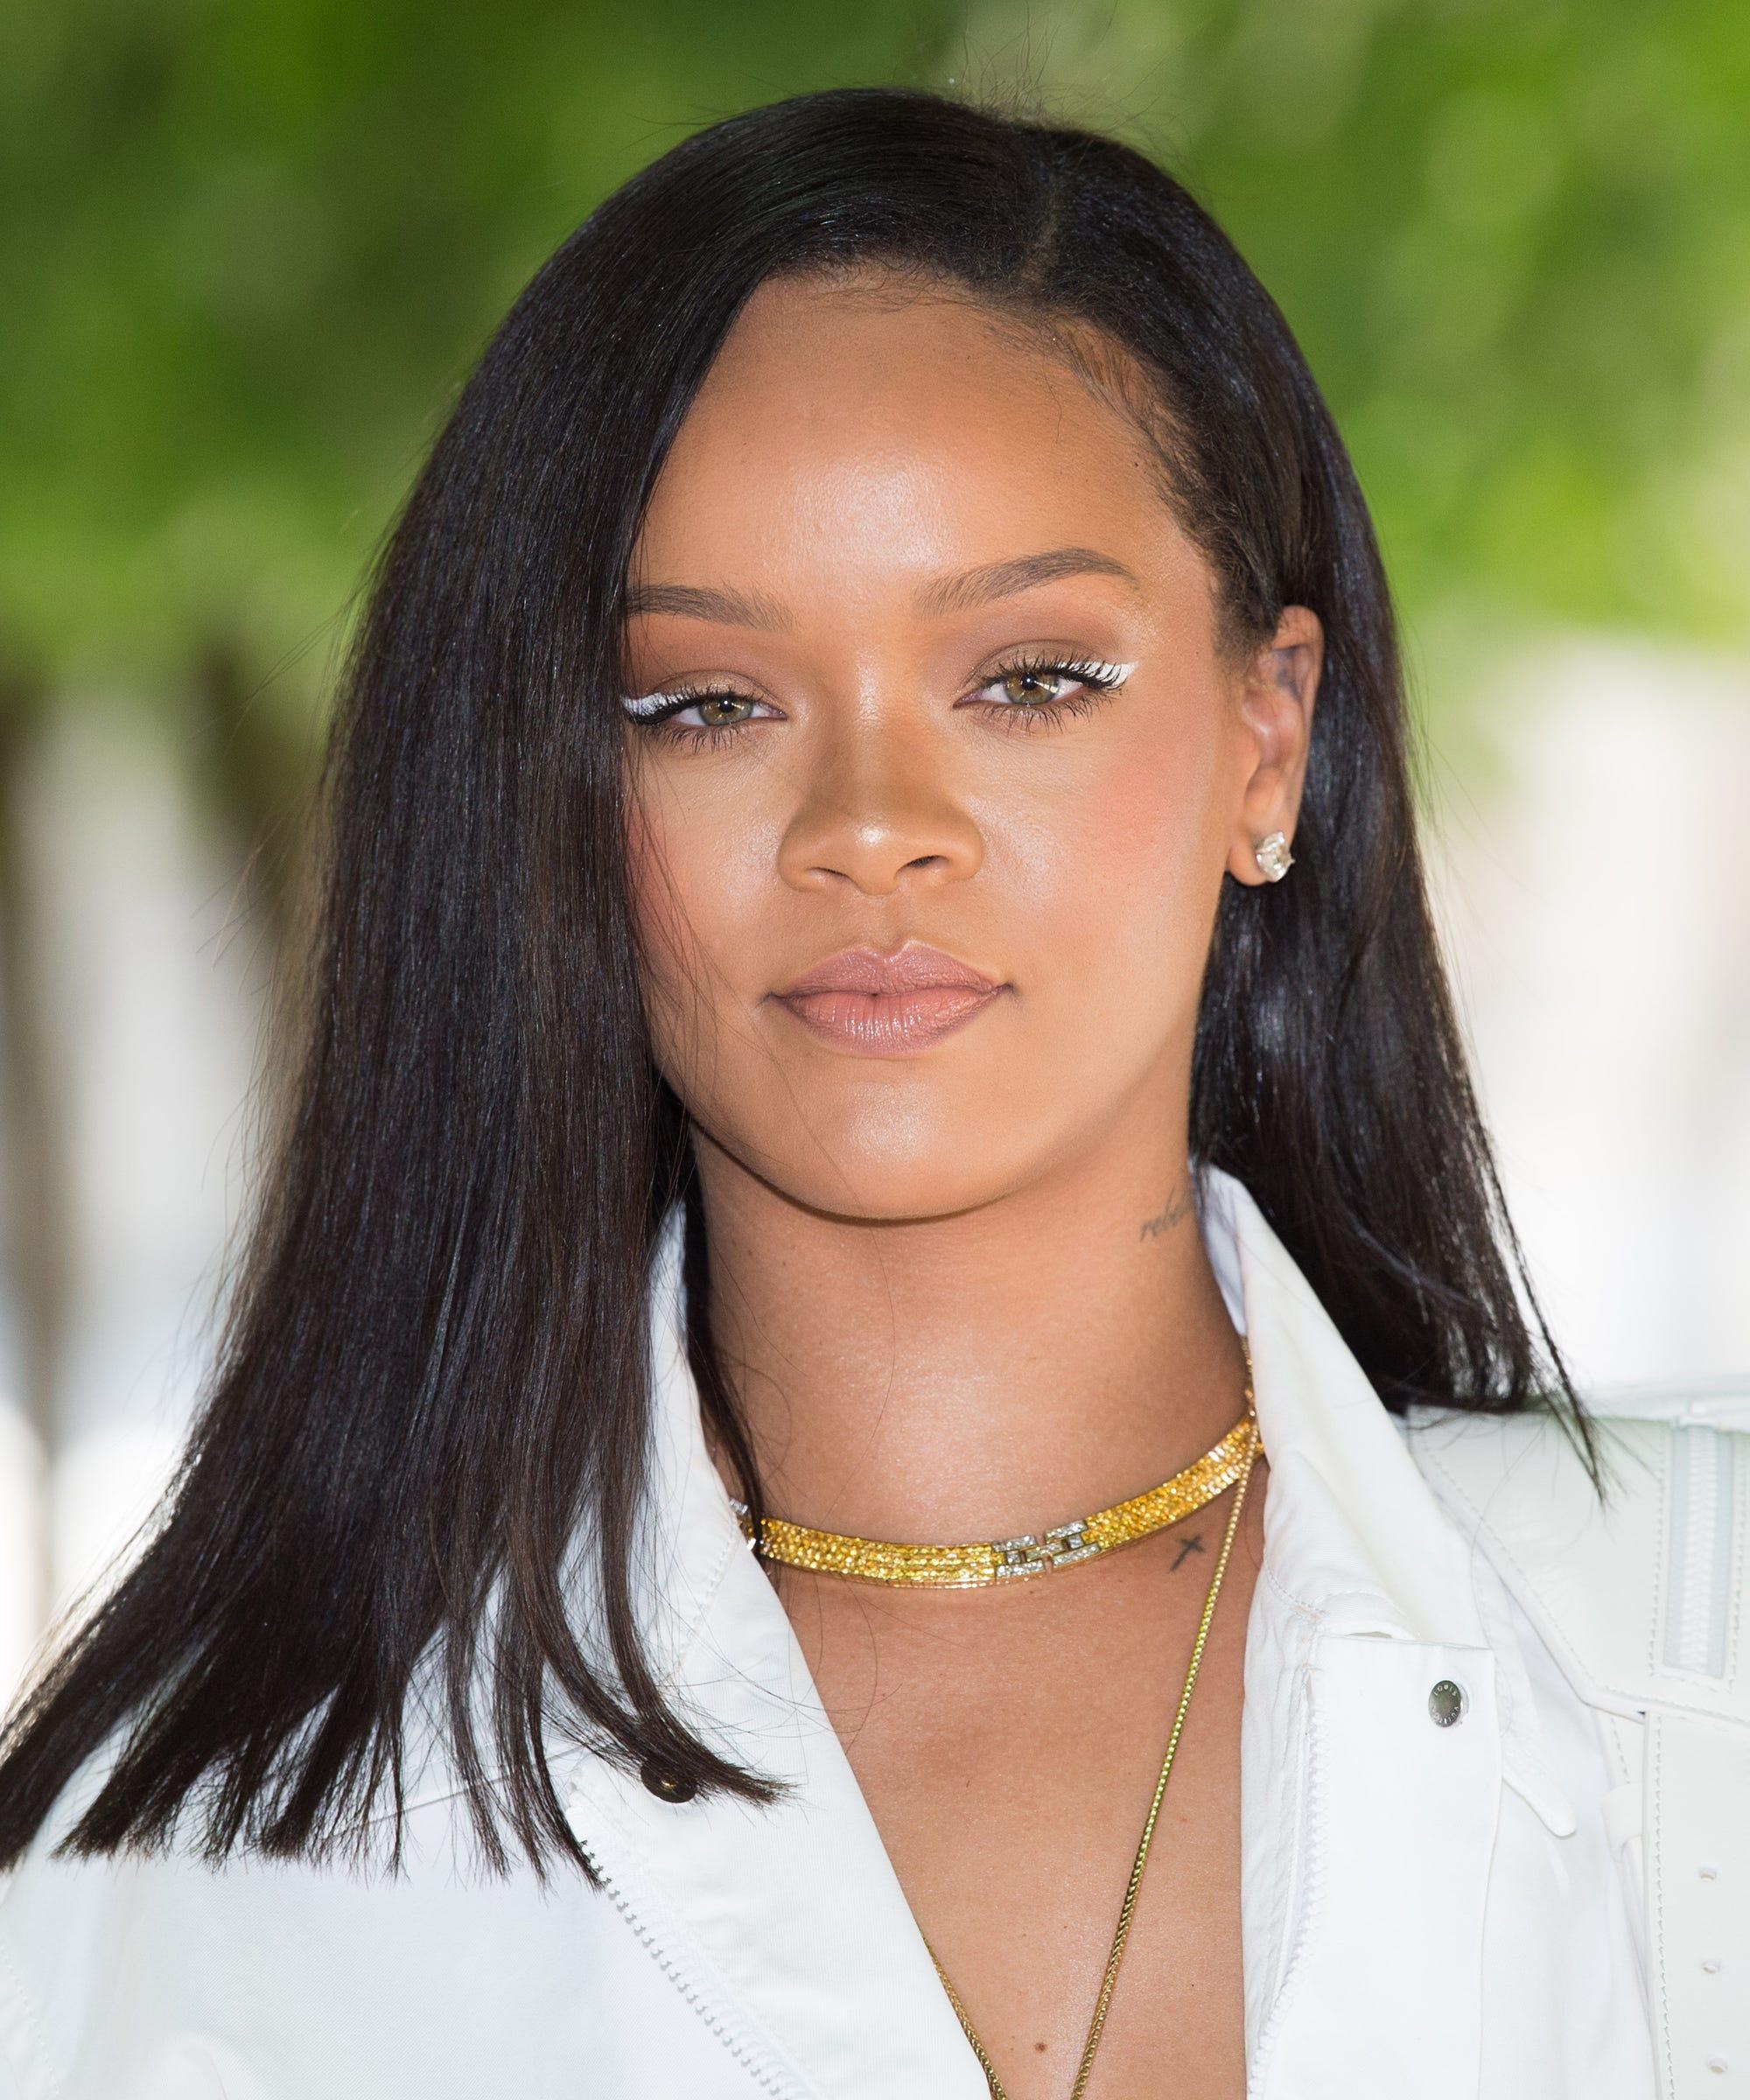 Rihanna's Makeup Artist Priscilla Ono Reveals Her Hack for Dewy, Winter-ProofSkin